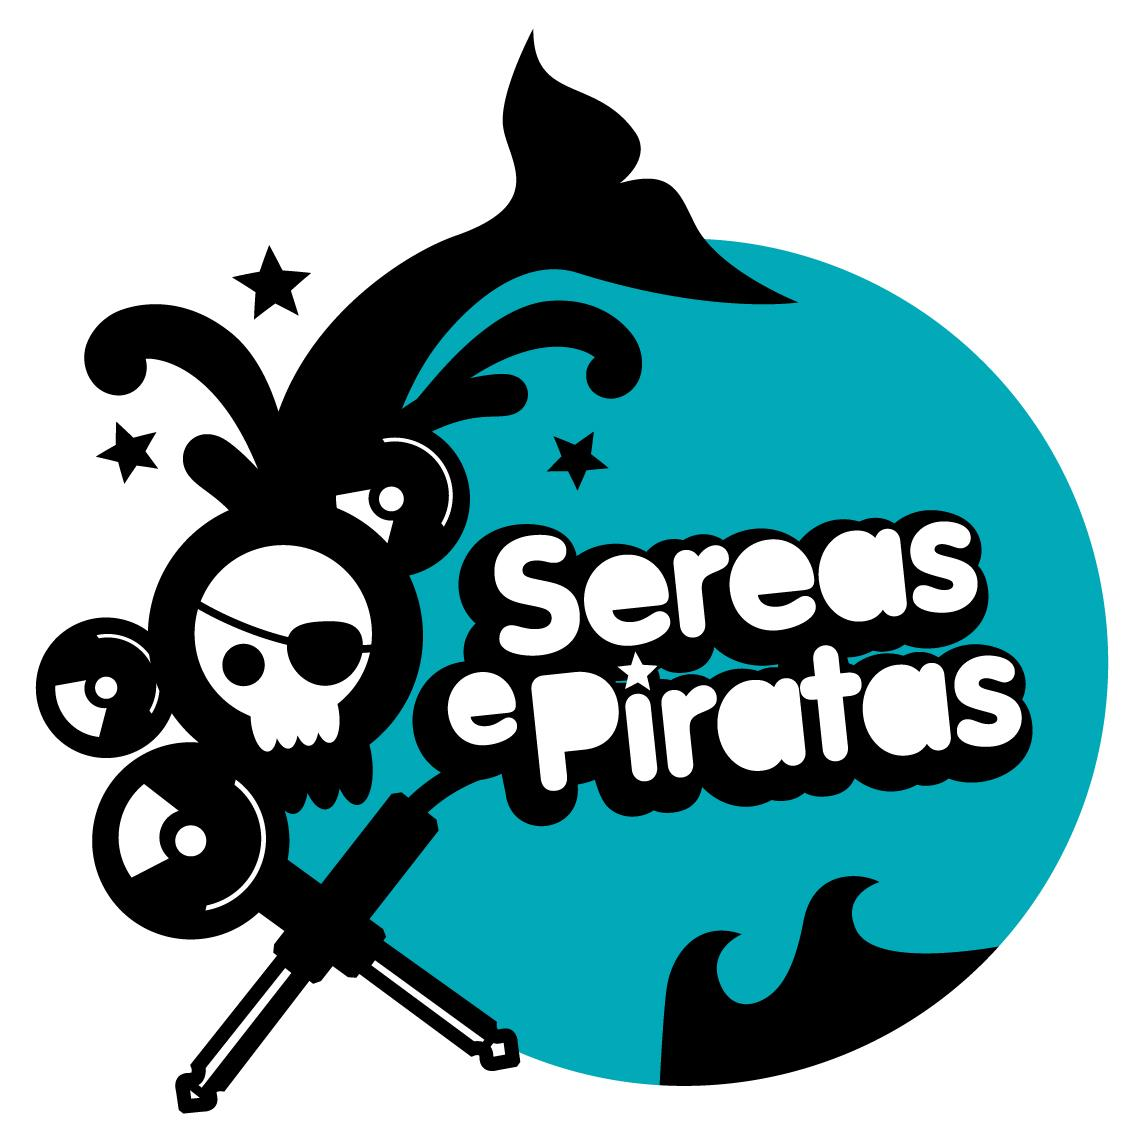 09. Sereas e Piratas